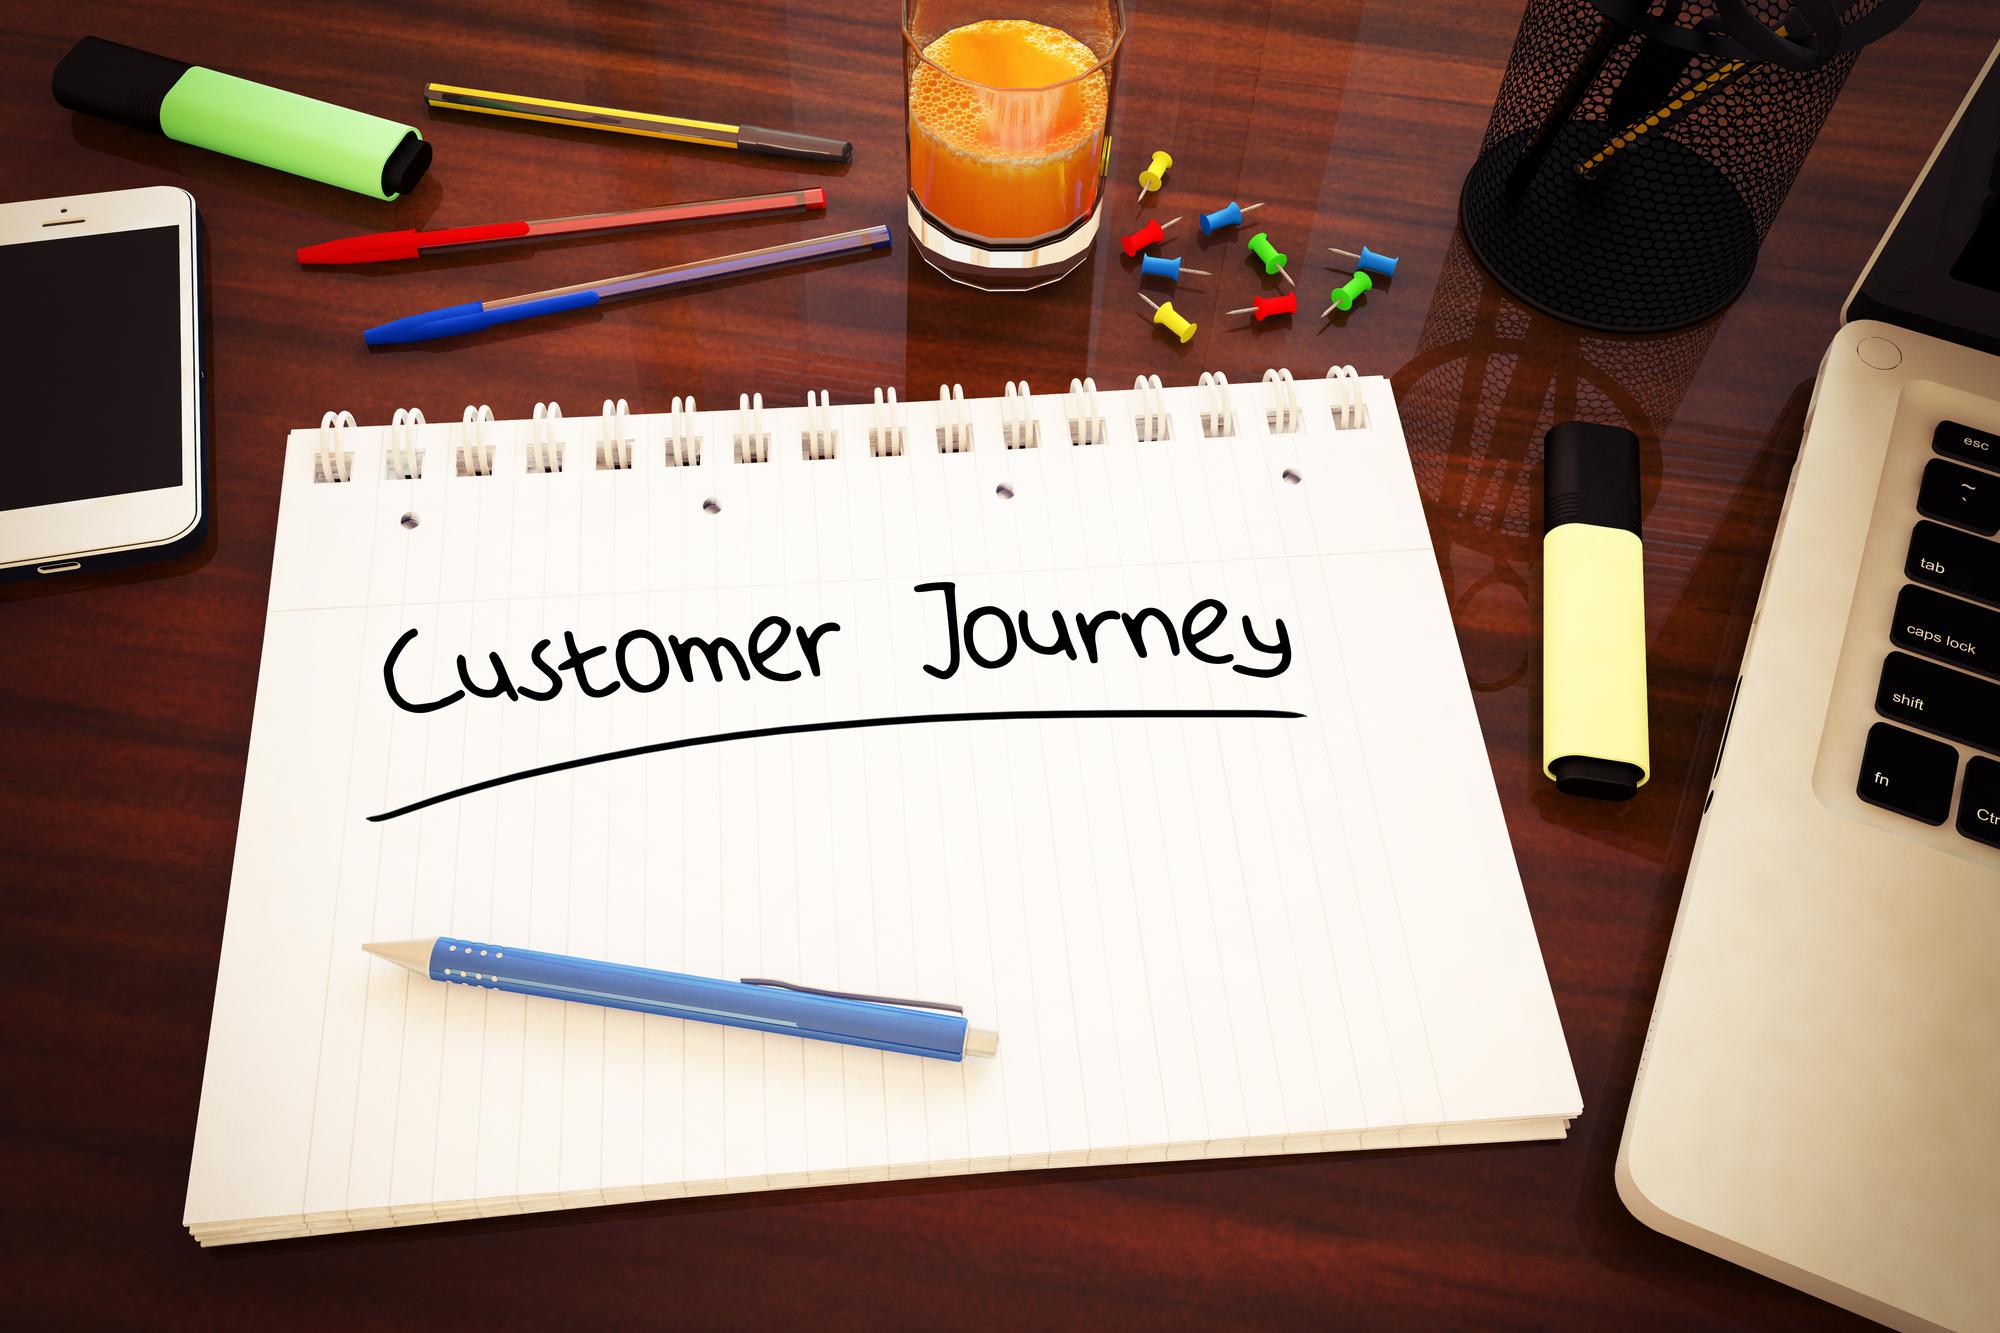 Customer_Journey_small